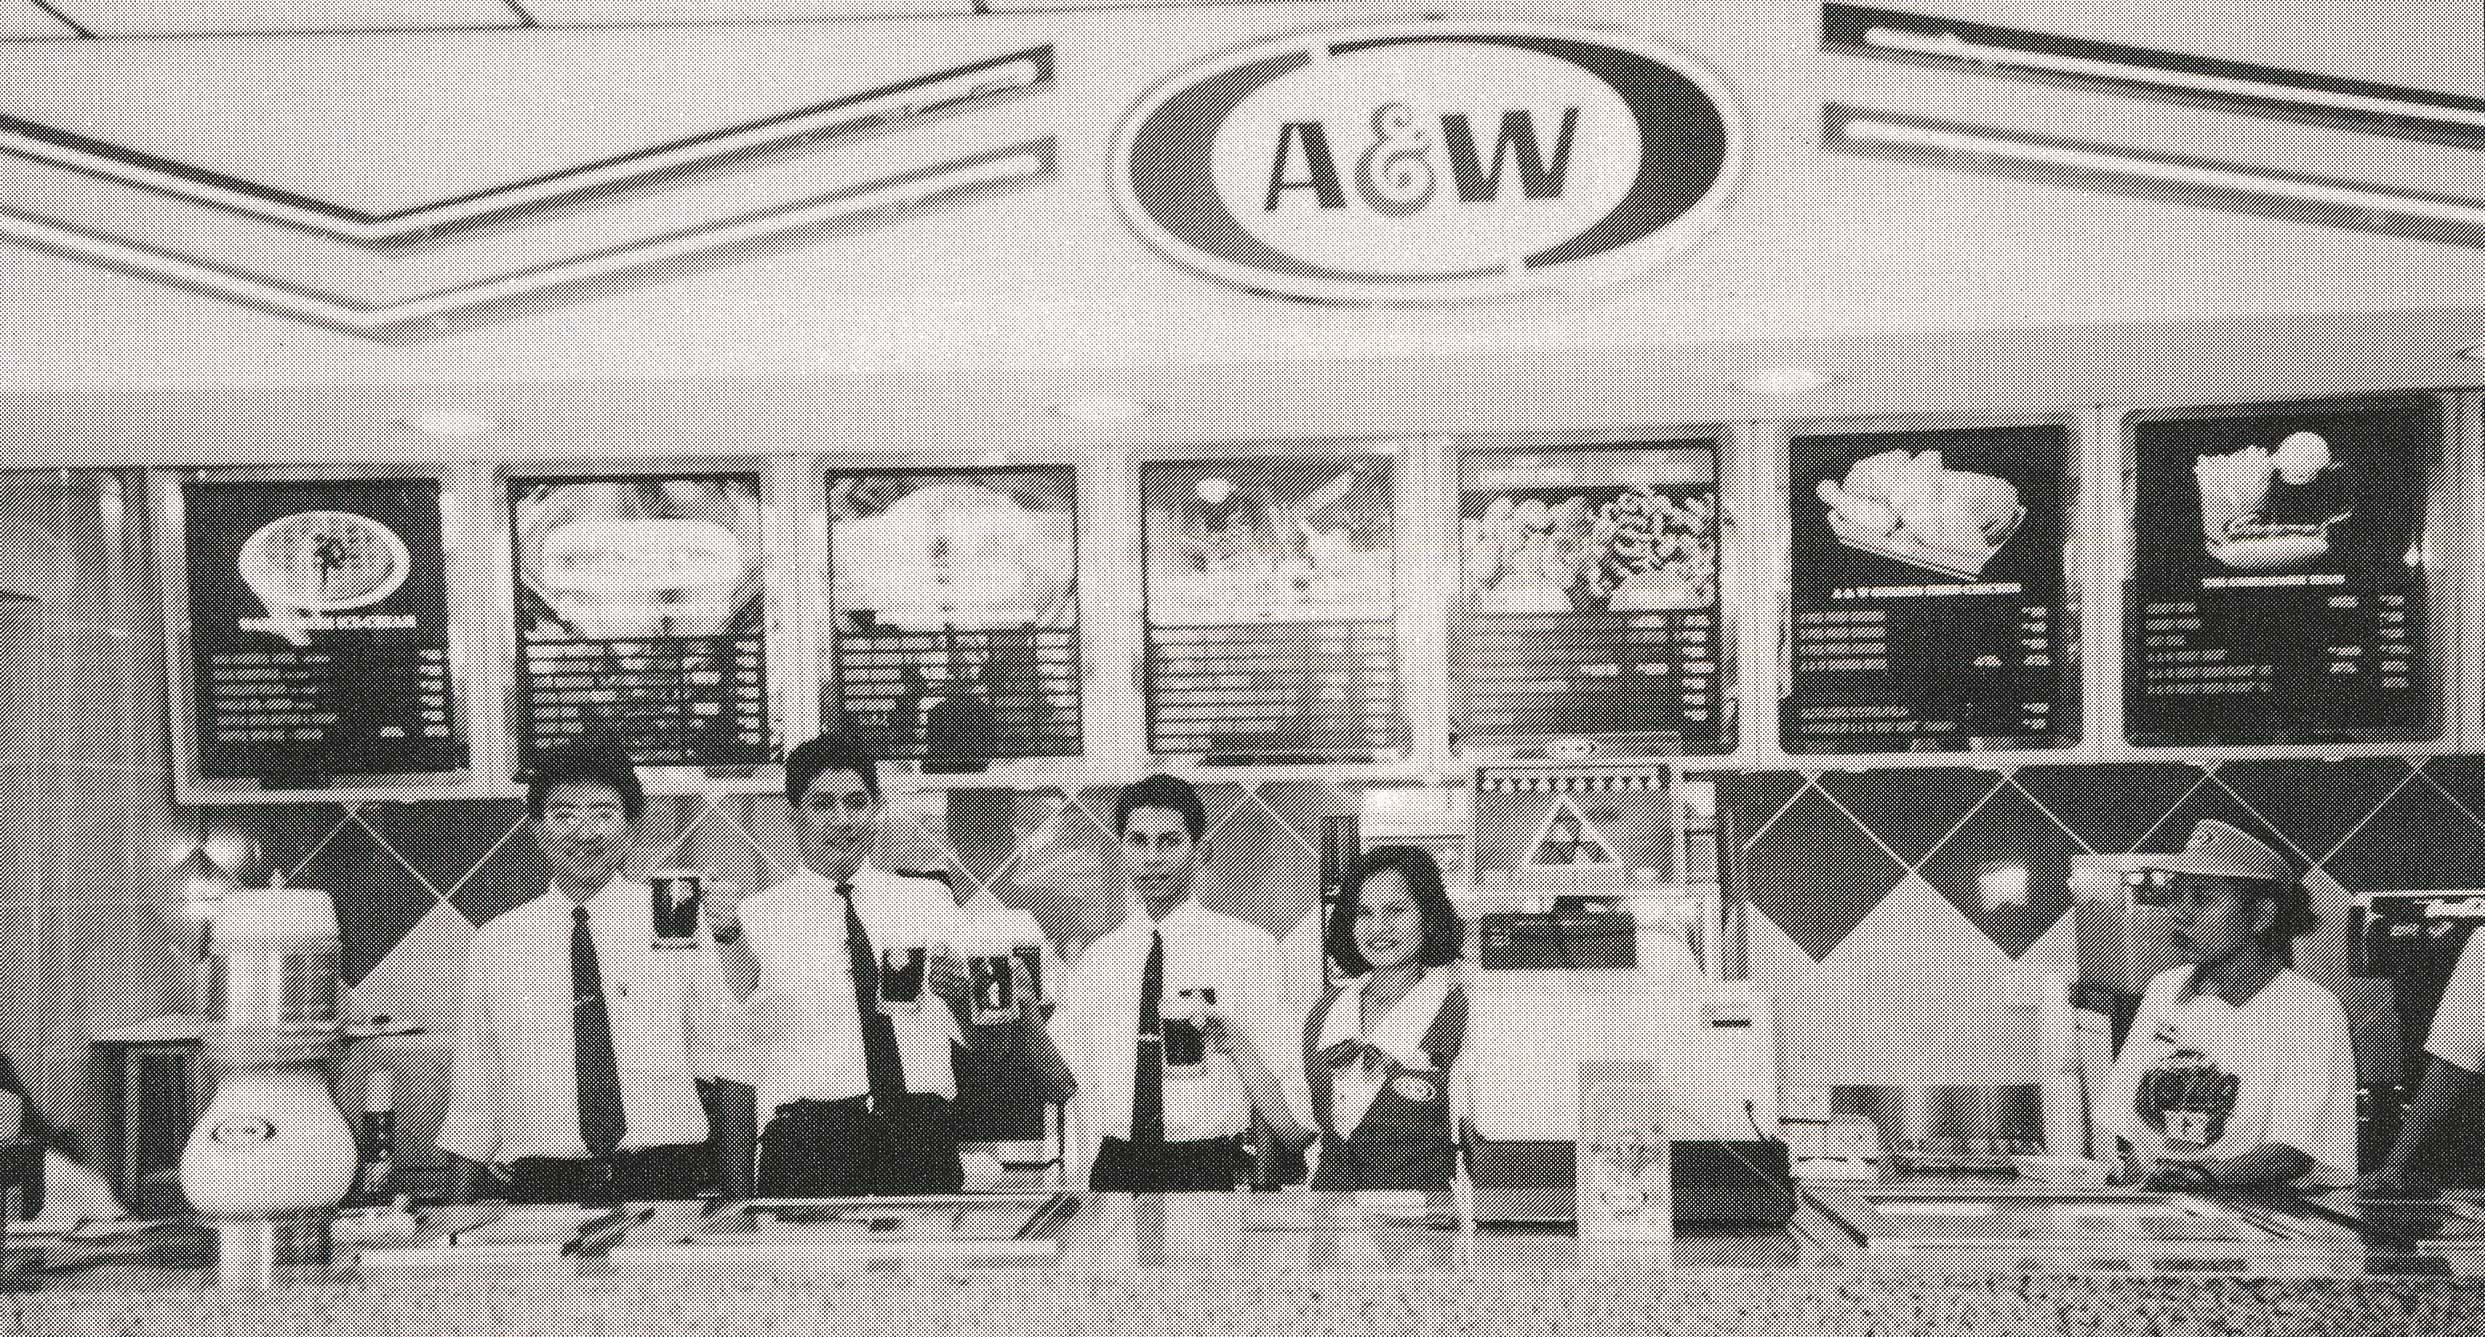 Malaysian A&W Restaurant crew, 1960s